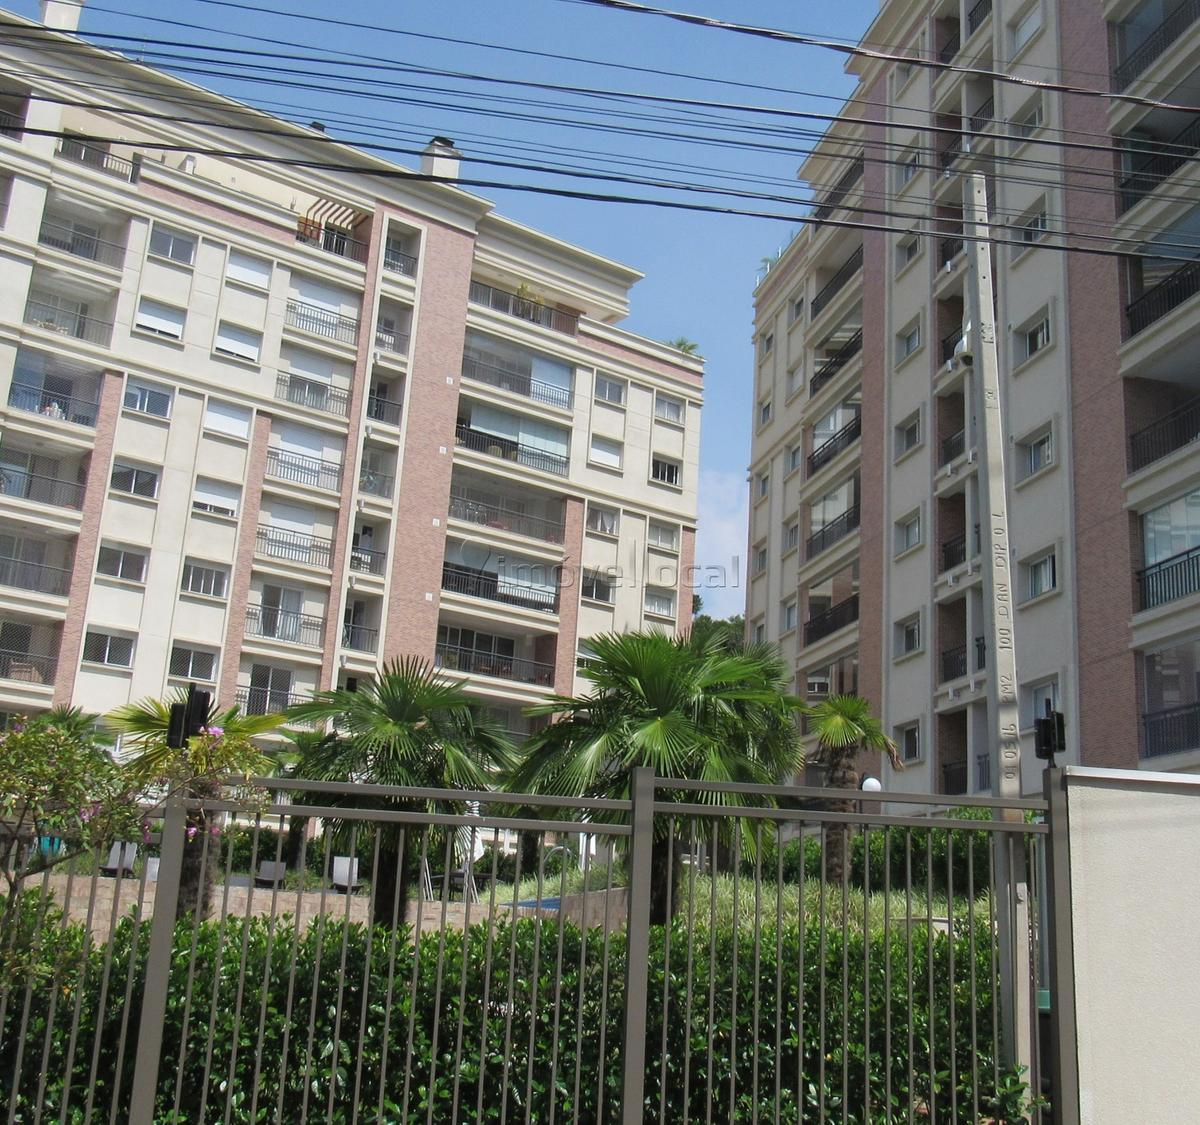 http://www.infocenterhost2.com.br/crm/fotosimovel/442941/104228881-apartamento-curitiba-ecoville.jpg